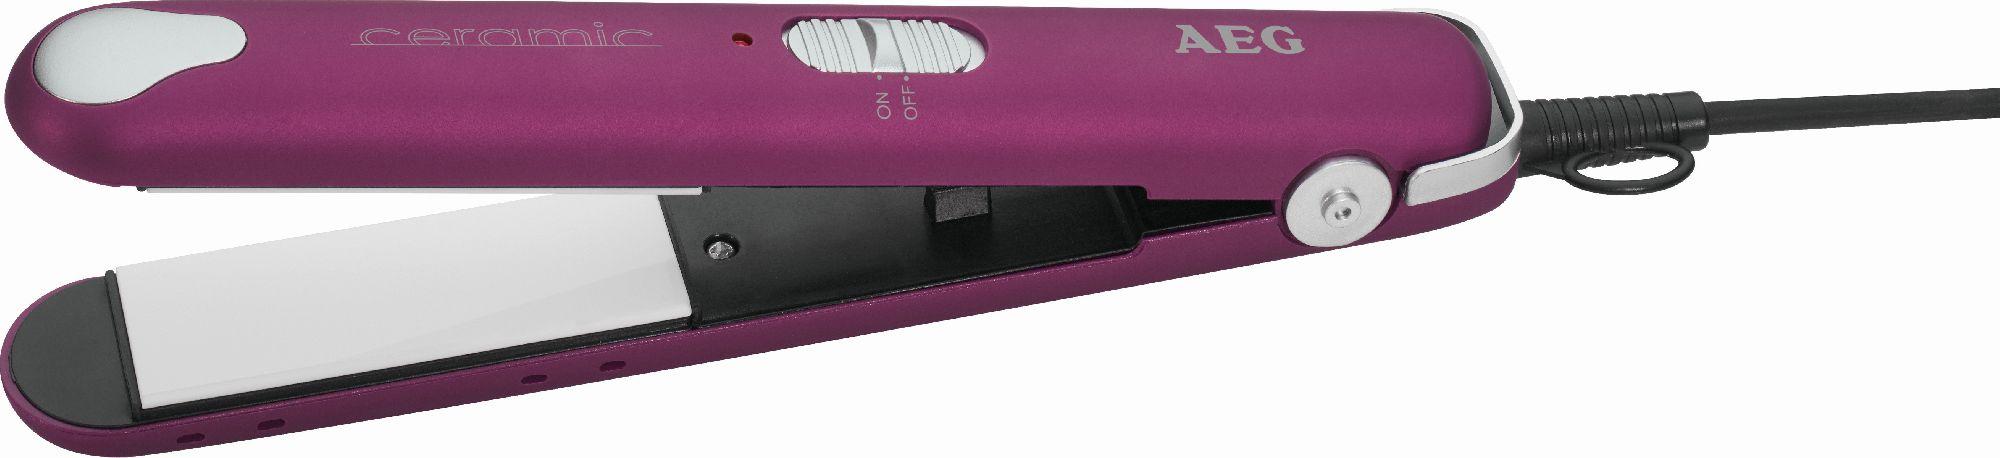 Prostownica for hair AEG HC 5680 fioletowa Matu taisnotājs